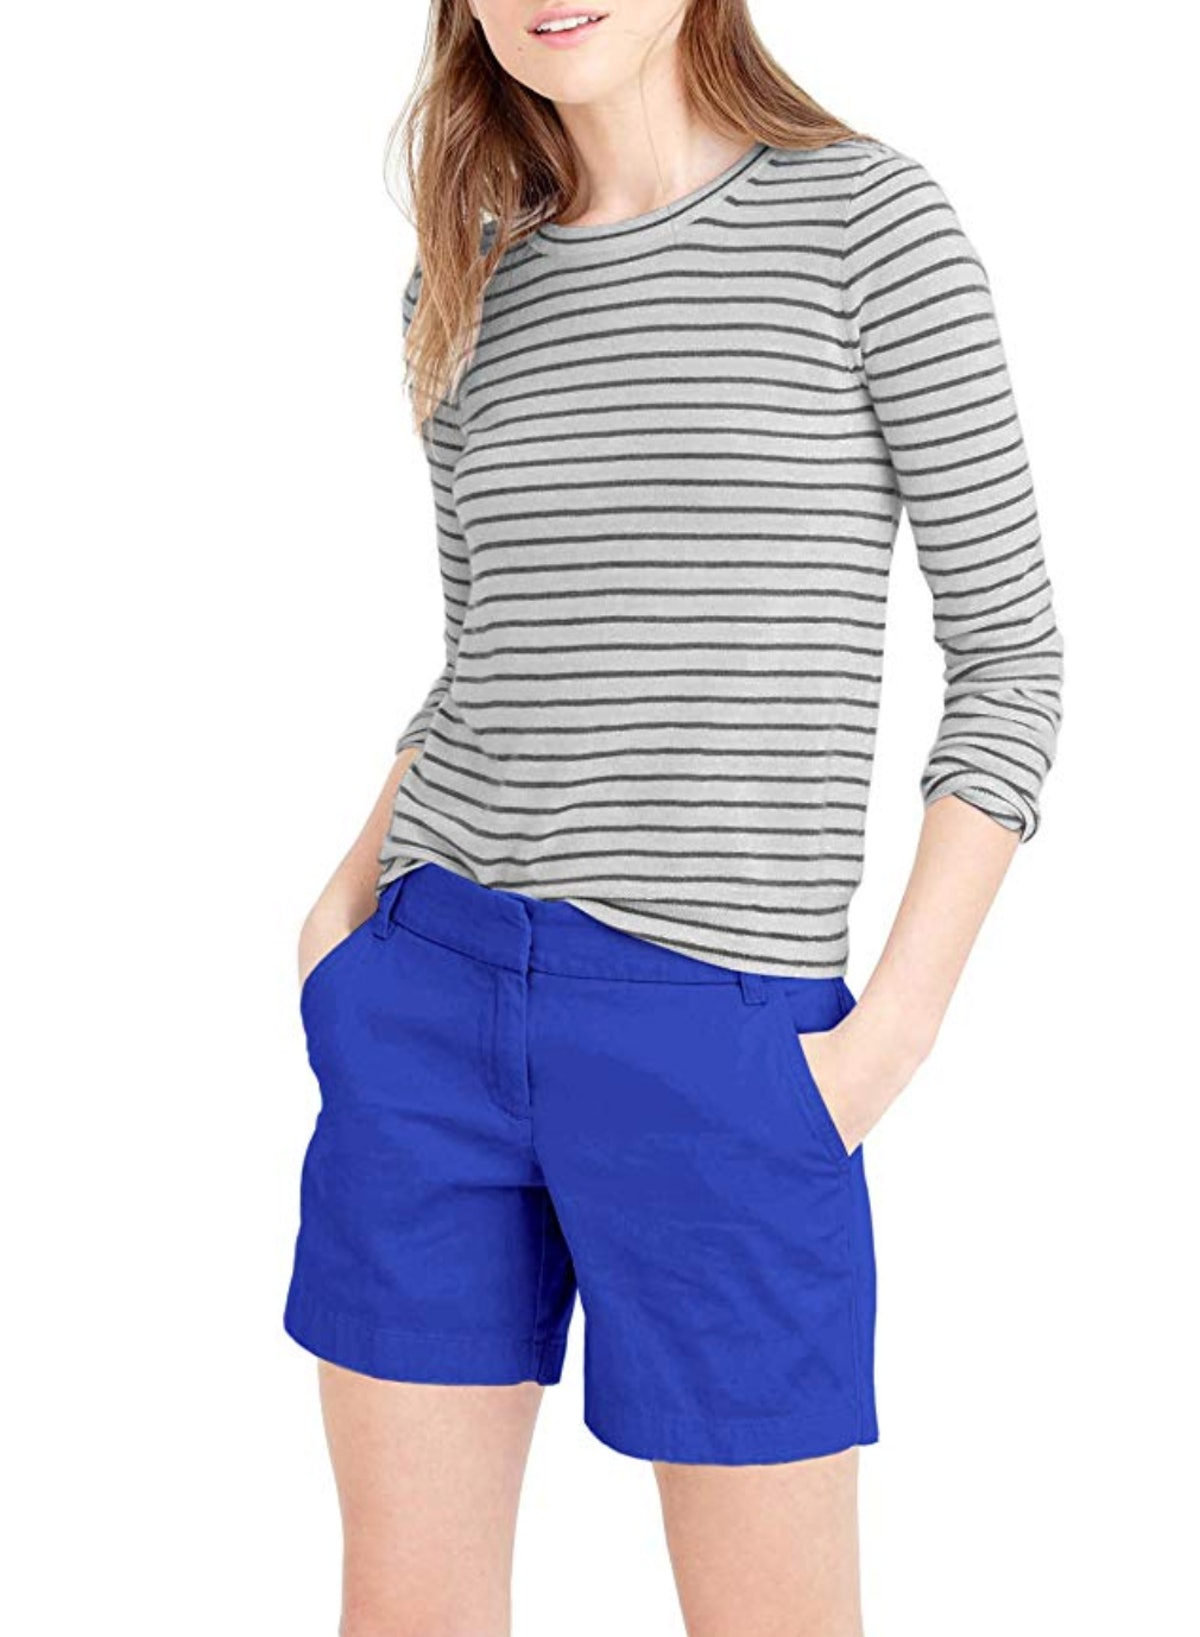 HyBrid & Company Women's Super Comfy Bermuda Walking Shorts